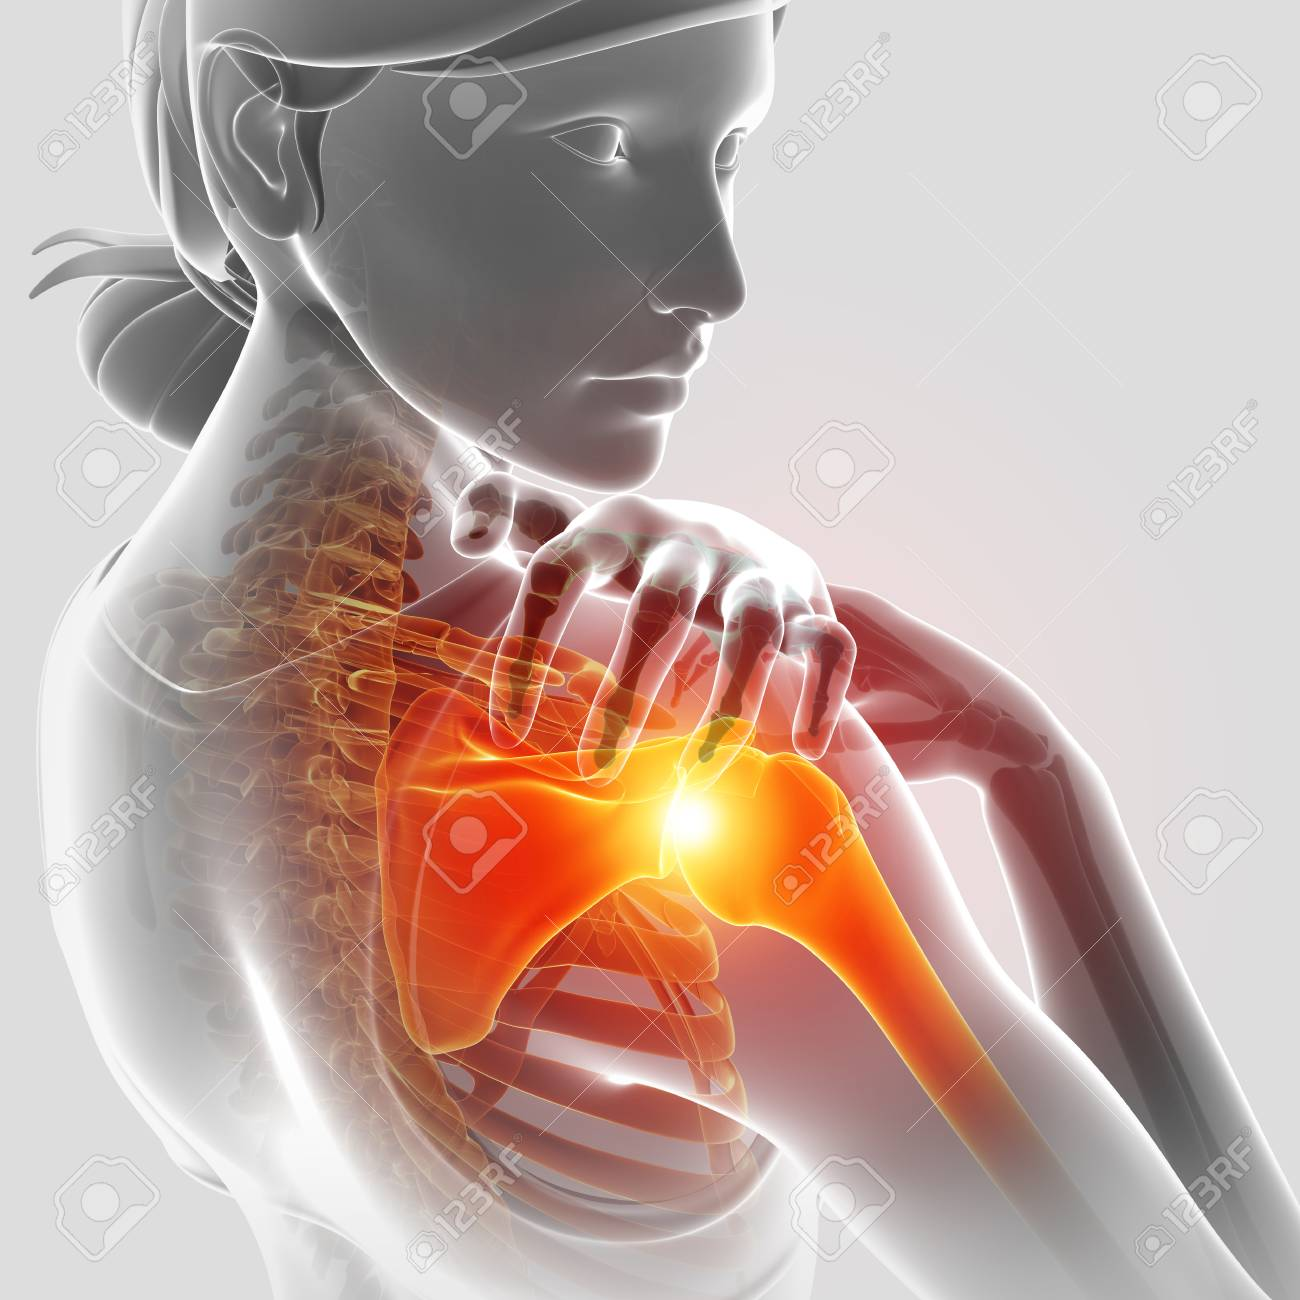 3d Illustration Of Female Feeling The Shoulder Pain Stock Photo ...